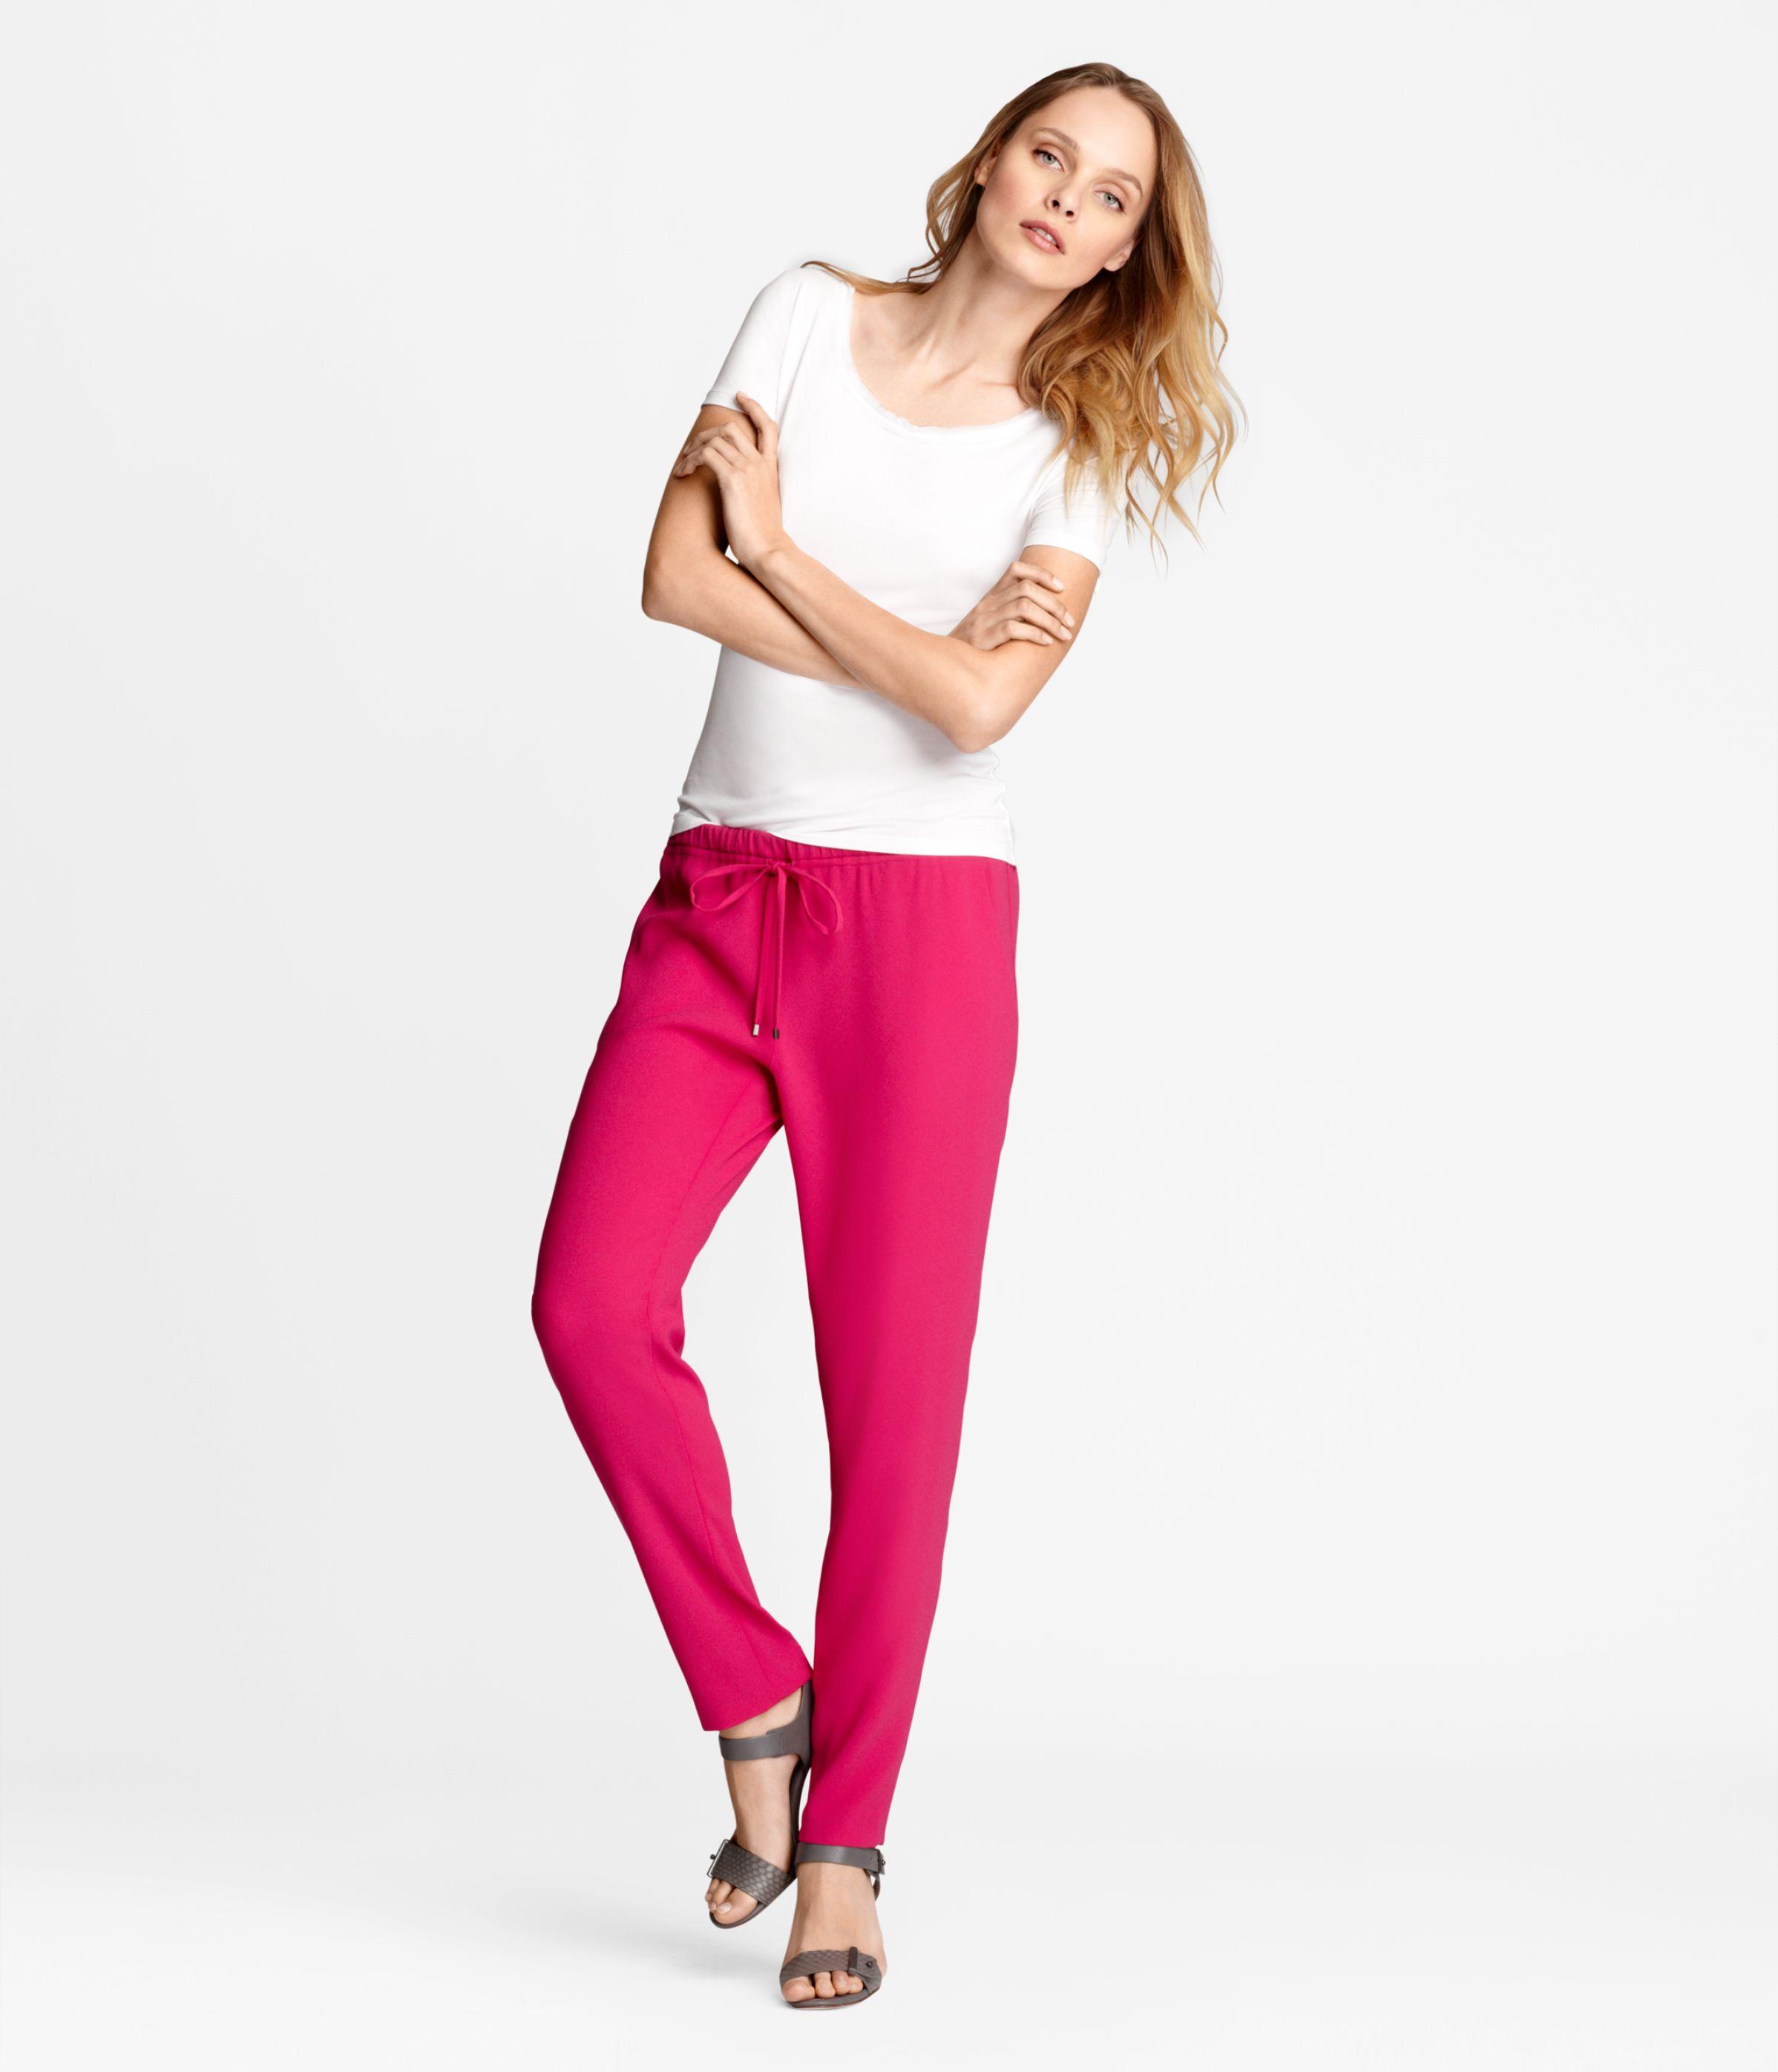 Emmy Pant Motion Magenta | Women's Pants & Shorts | Elie Tahari